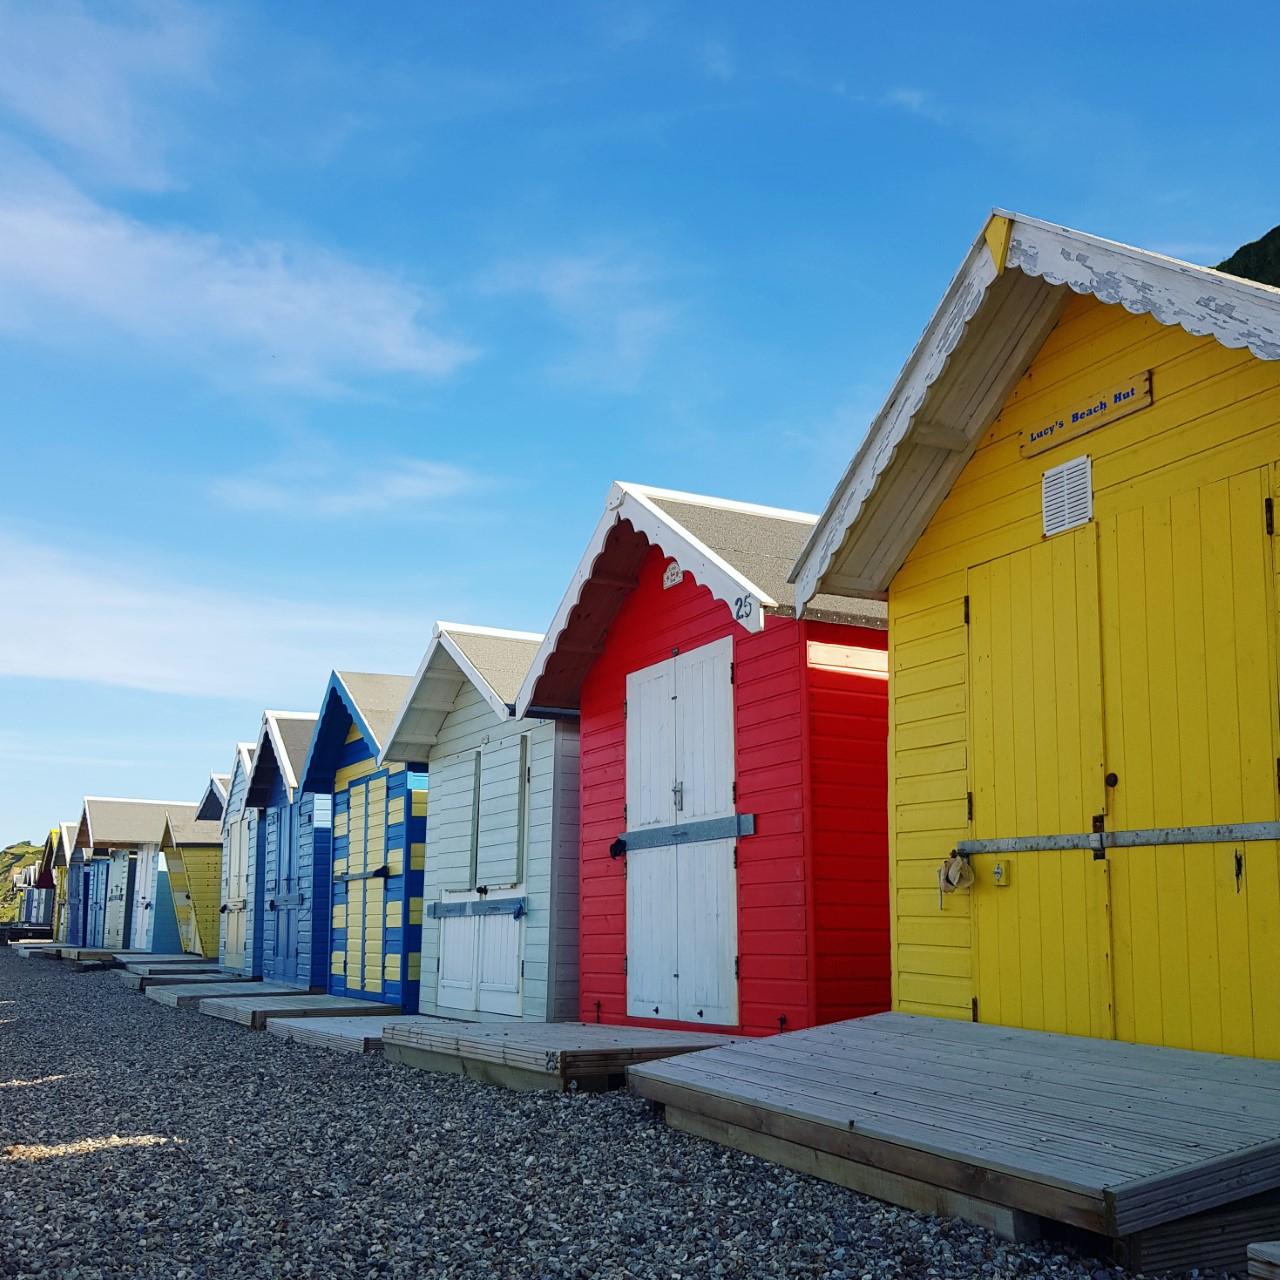 Norfolk Beach Huts by Alex Hamblin